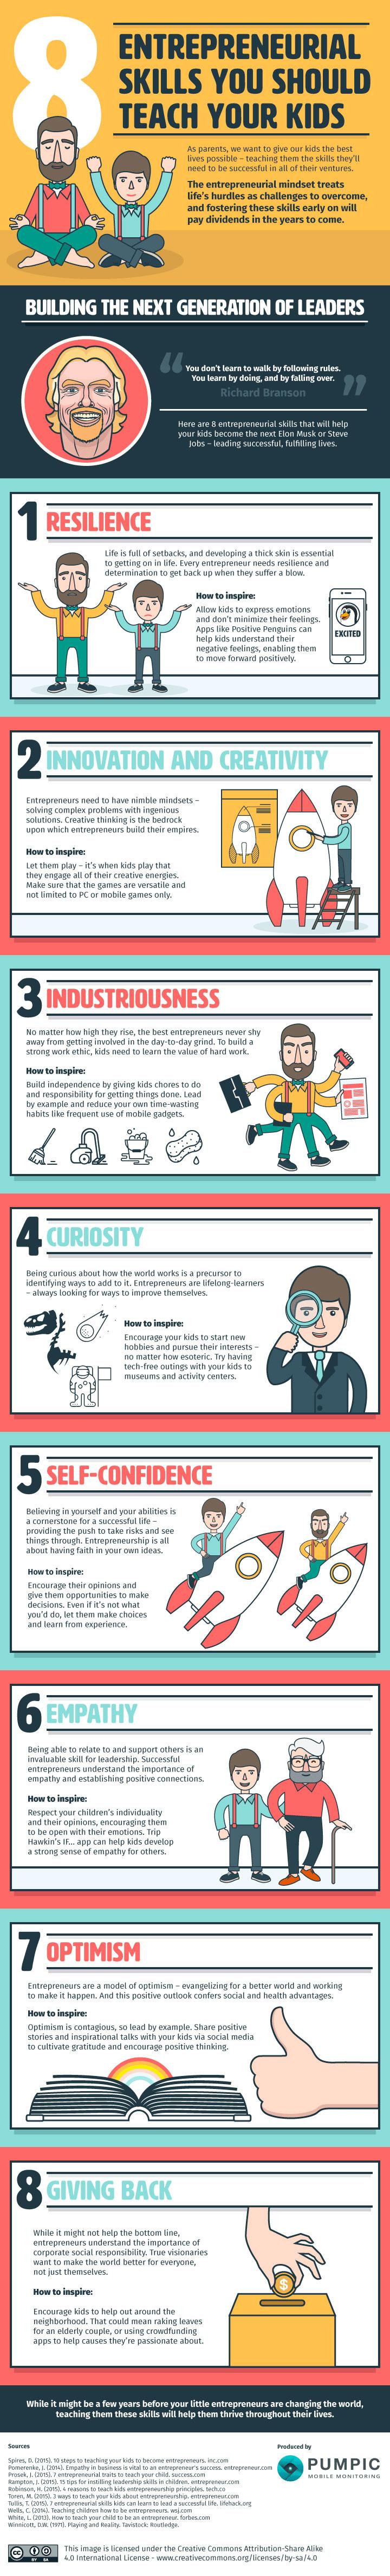 Entrepreneurial skills you should teach you kids